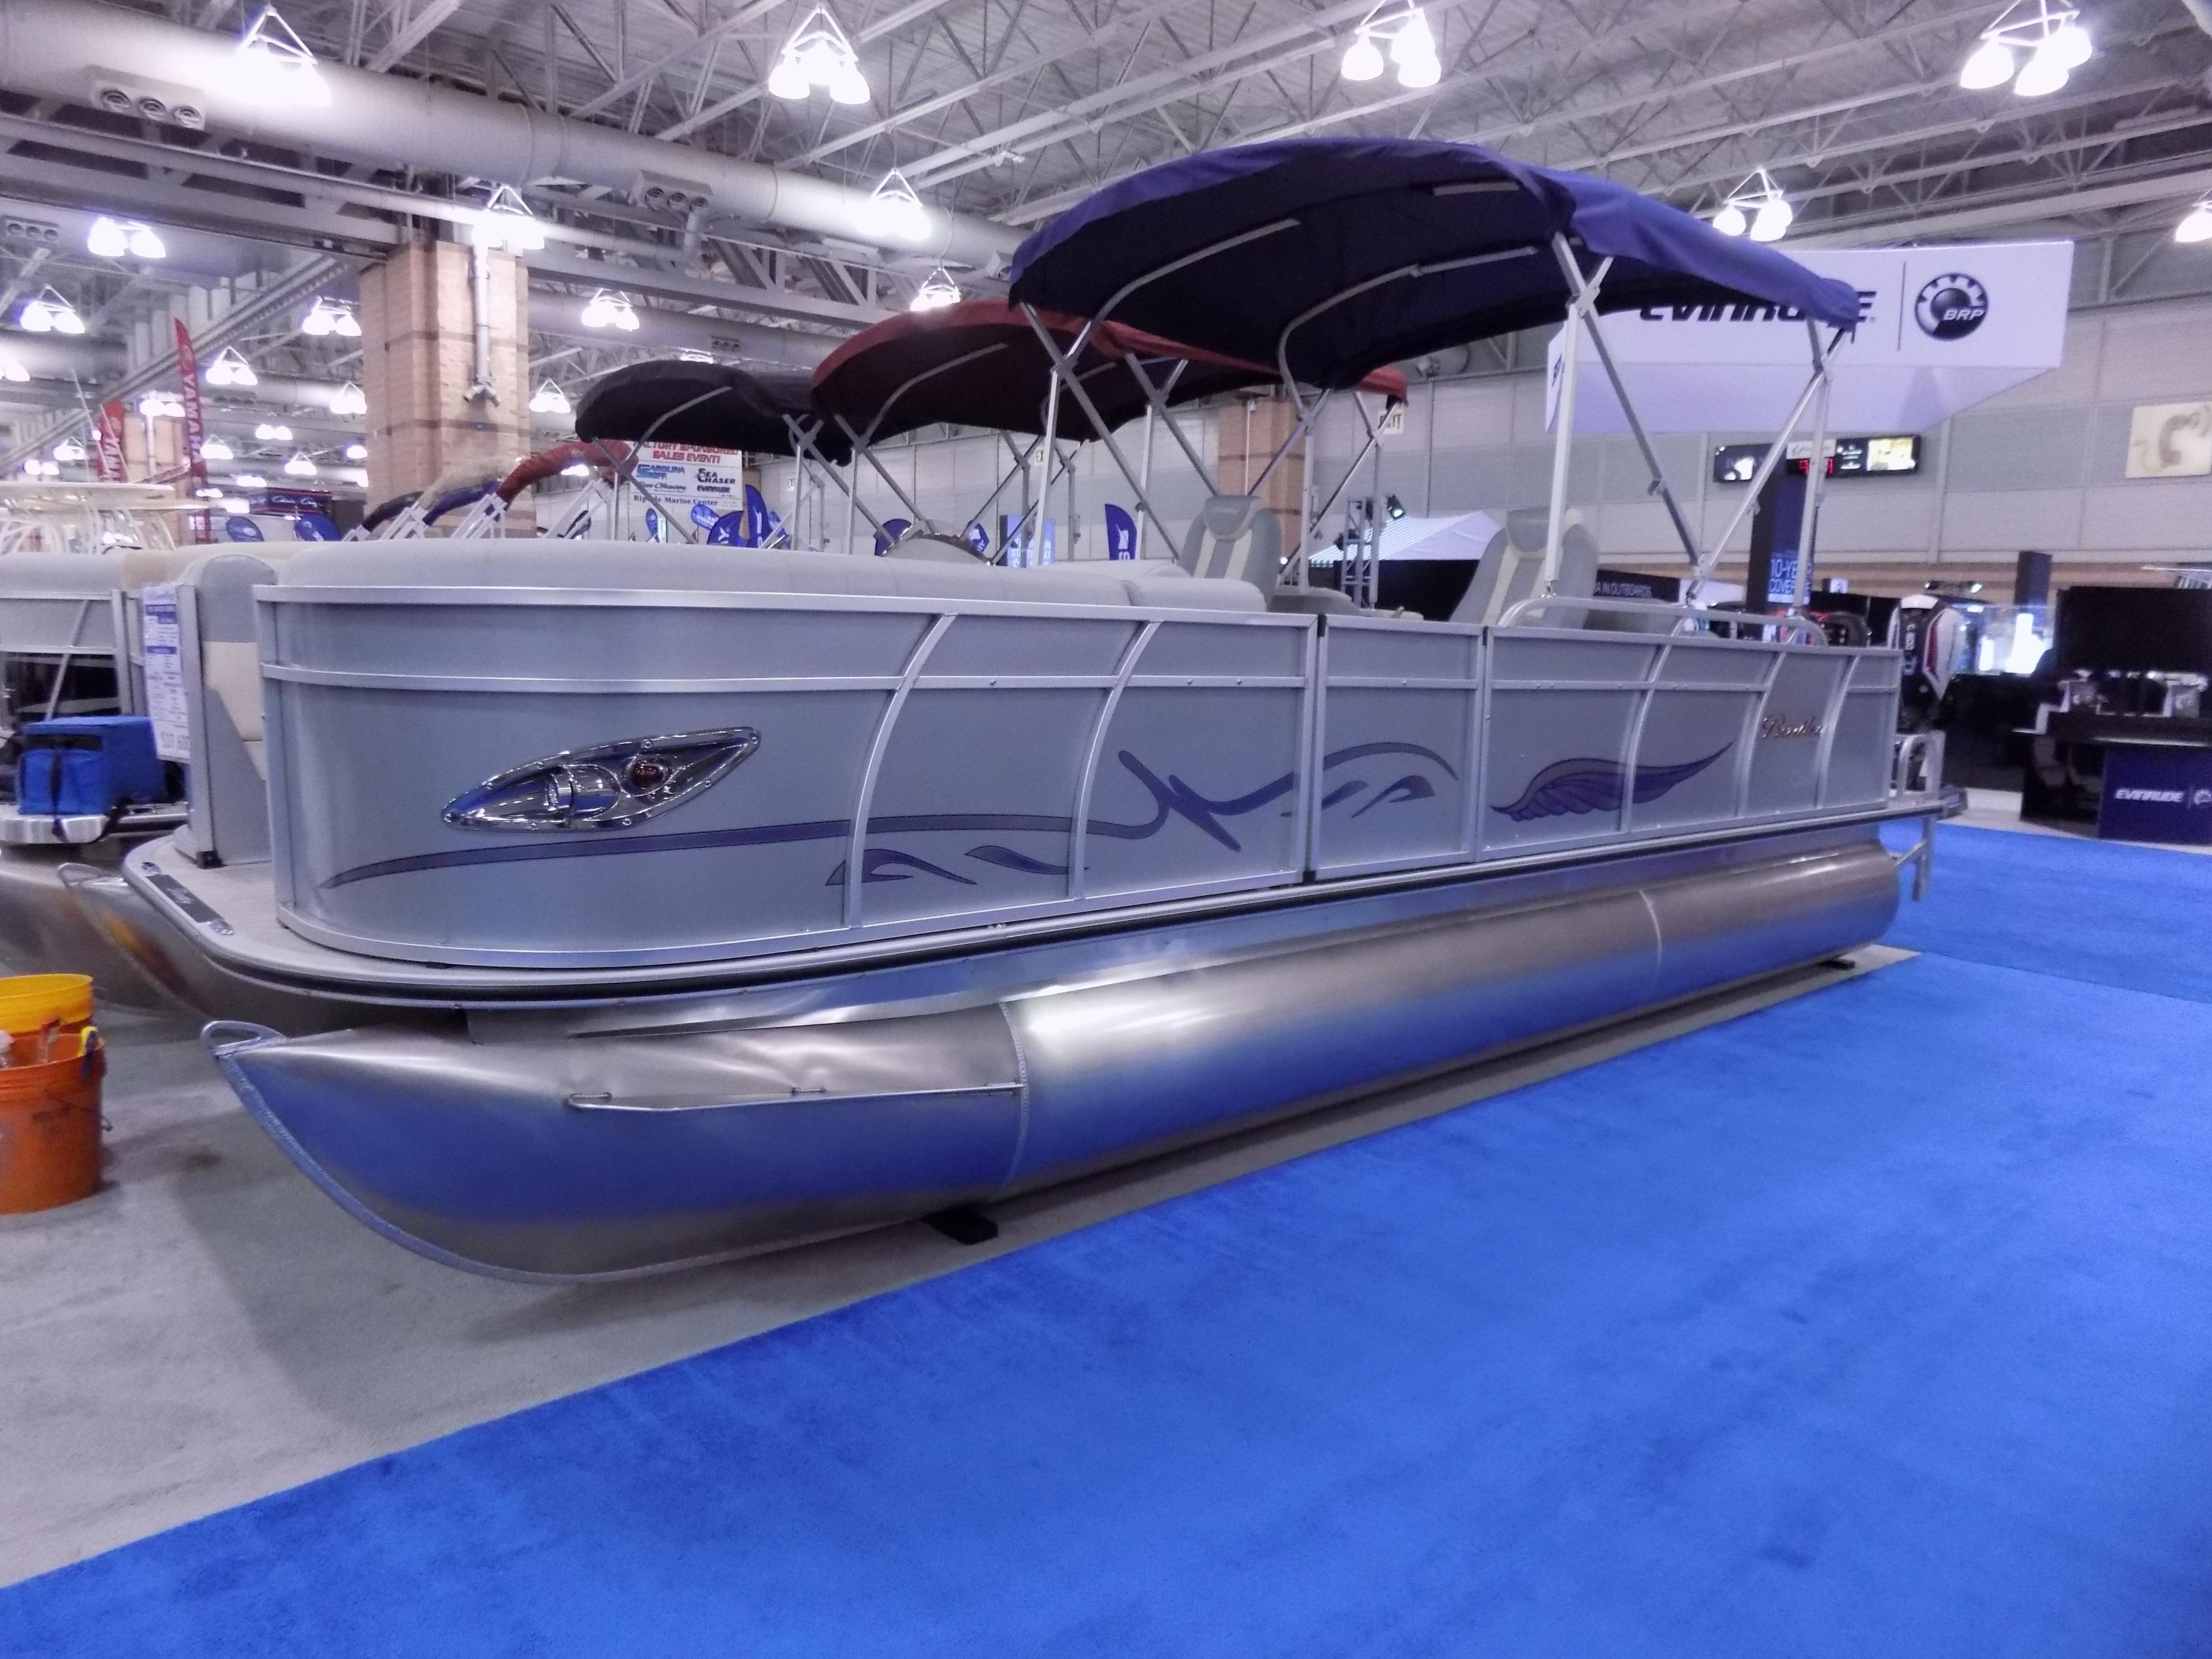 motor stk boat bentley pontoon sale youtube starcraft boats watch for mercury